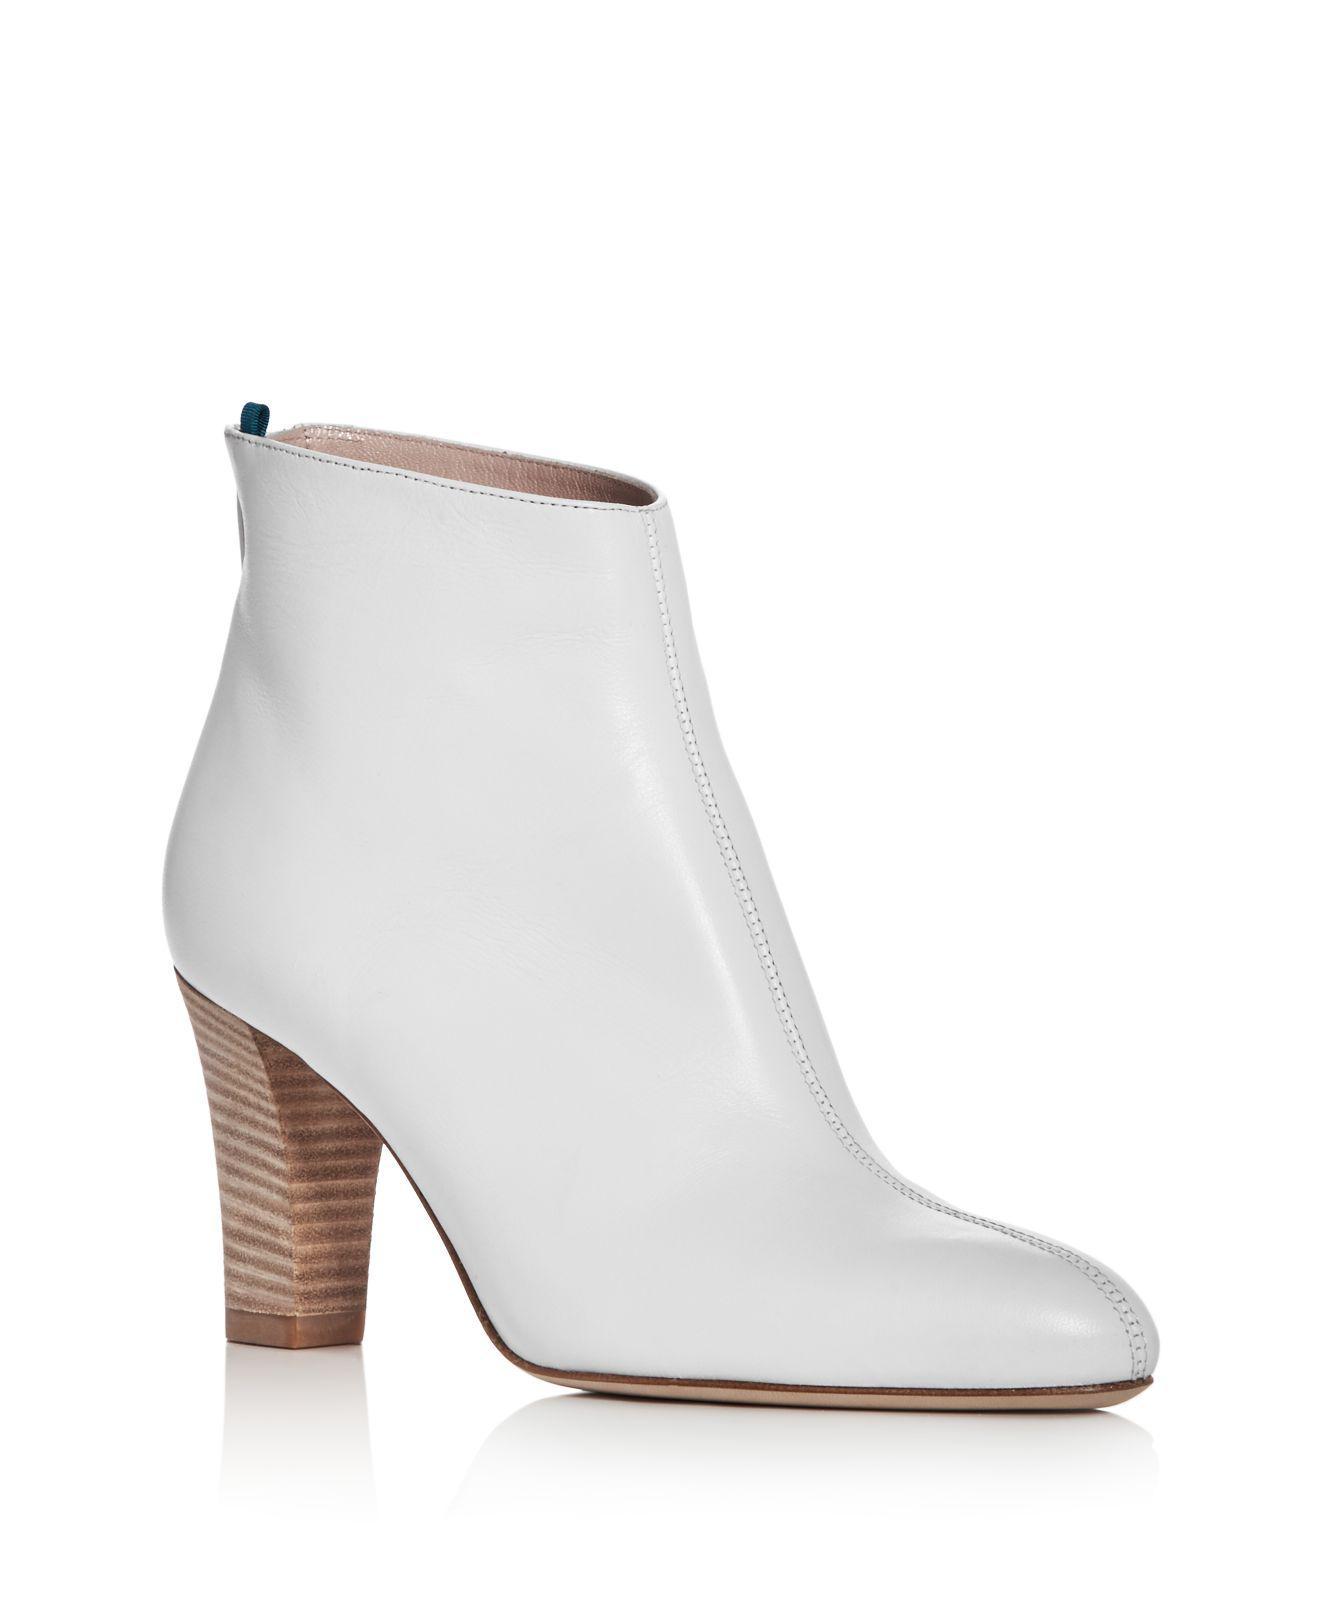 Sjp Minnie Velvet High-Heel Booties - 100% Exclusive Cheap Many Kinds Of 8i4CNtT